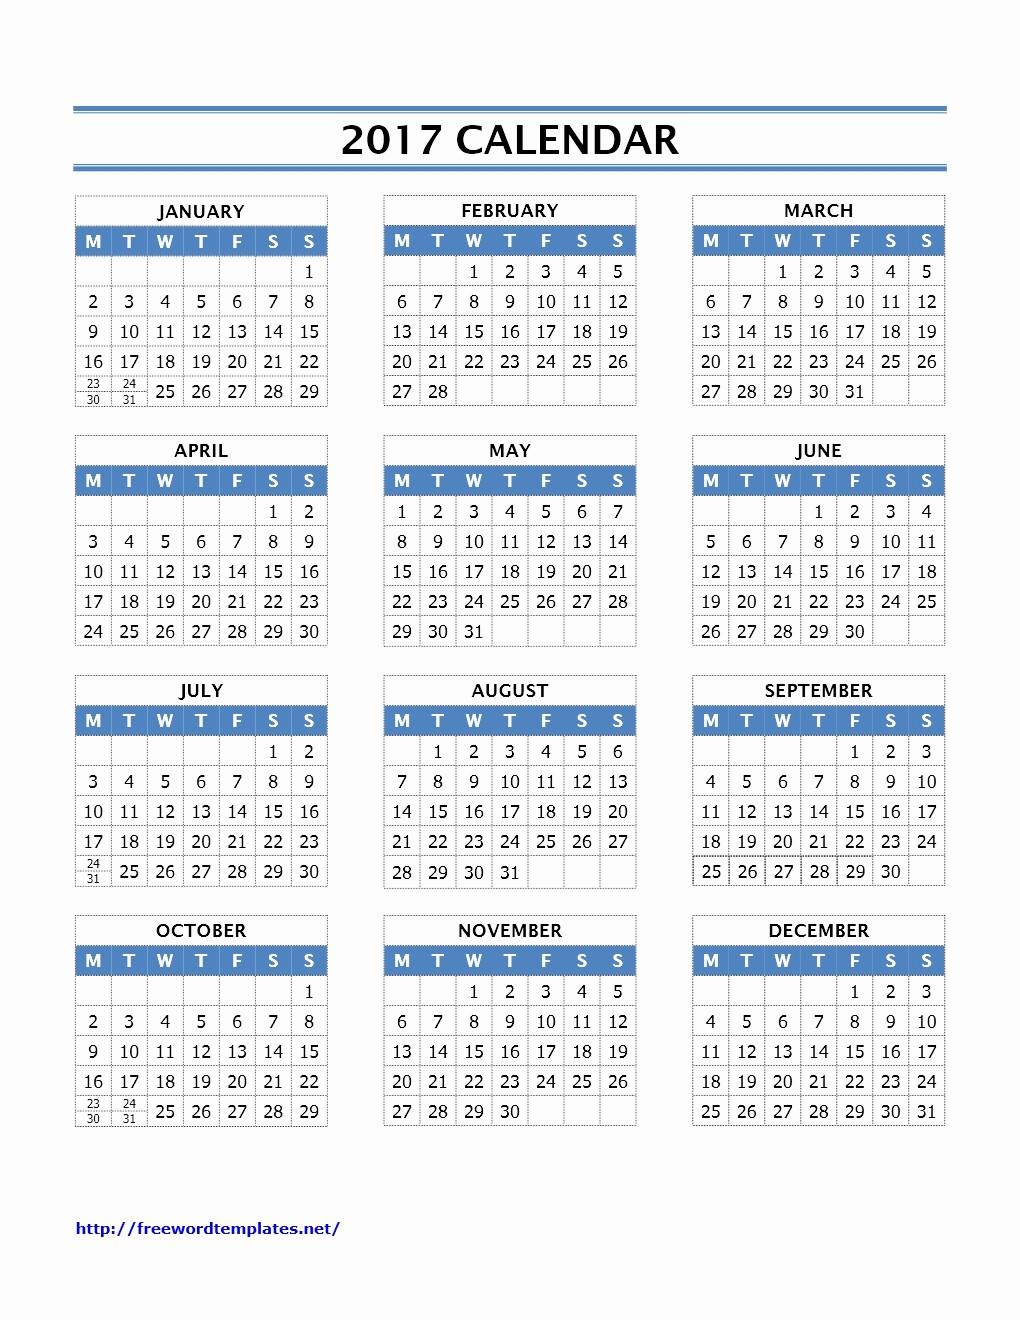 Calendar 2017 Template with Holidays Fresh Calendar Archives